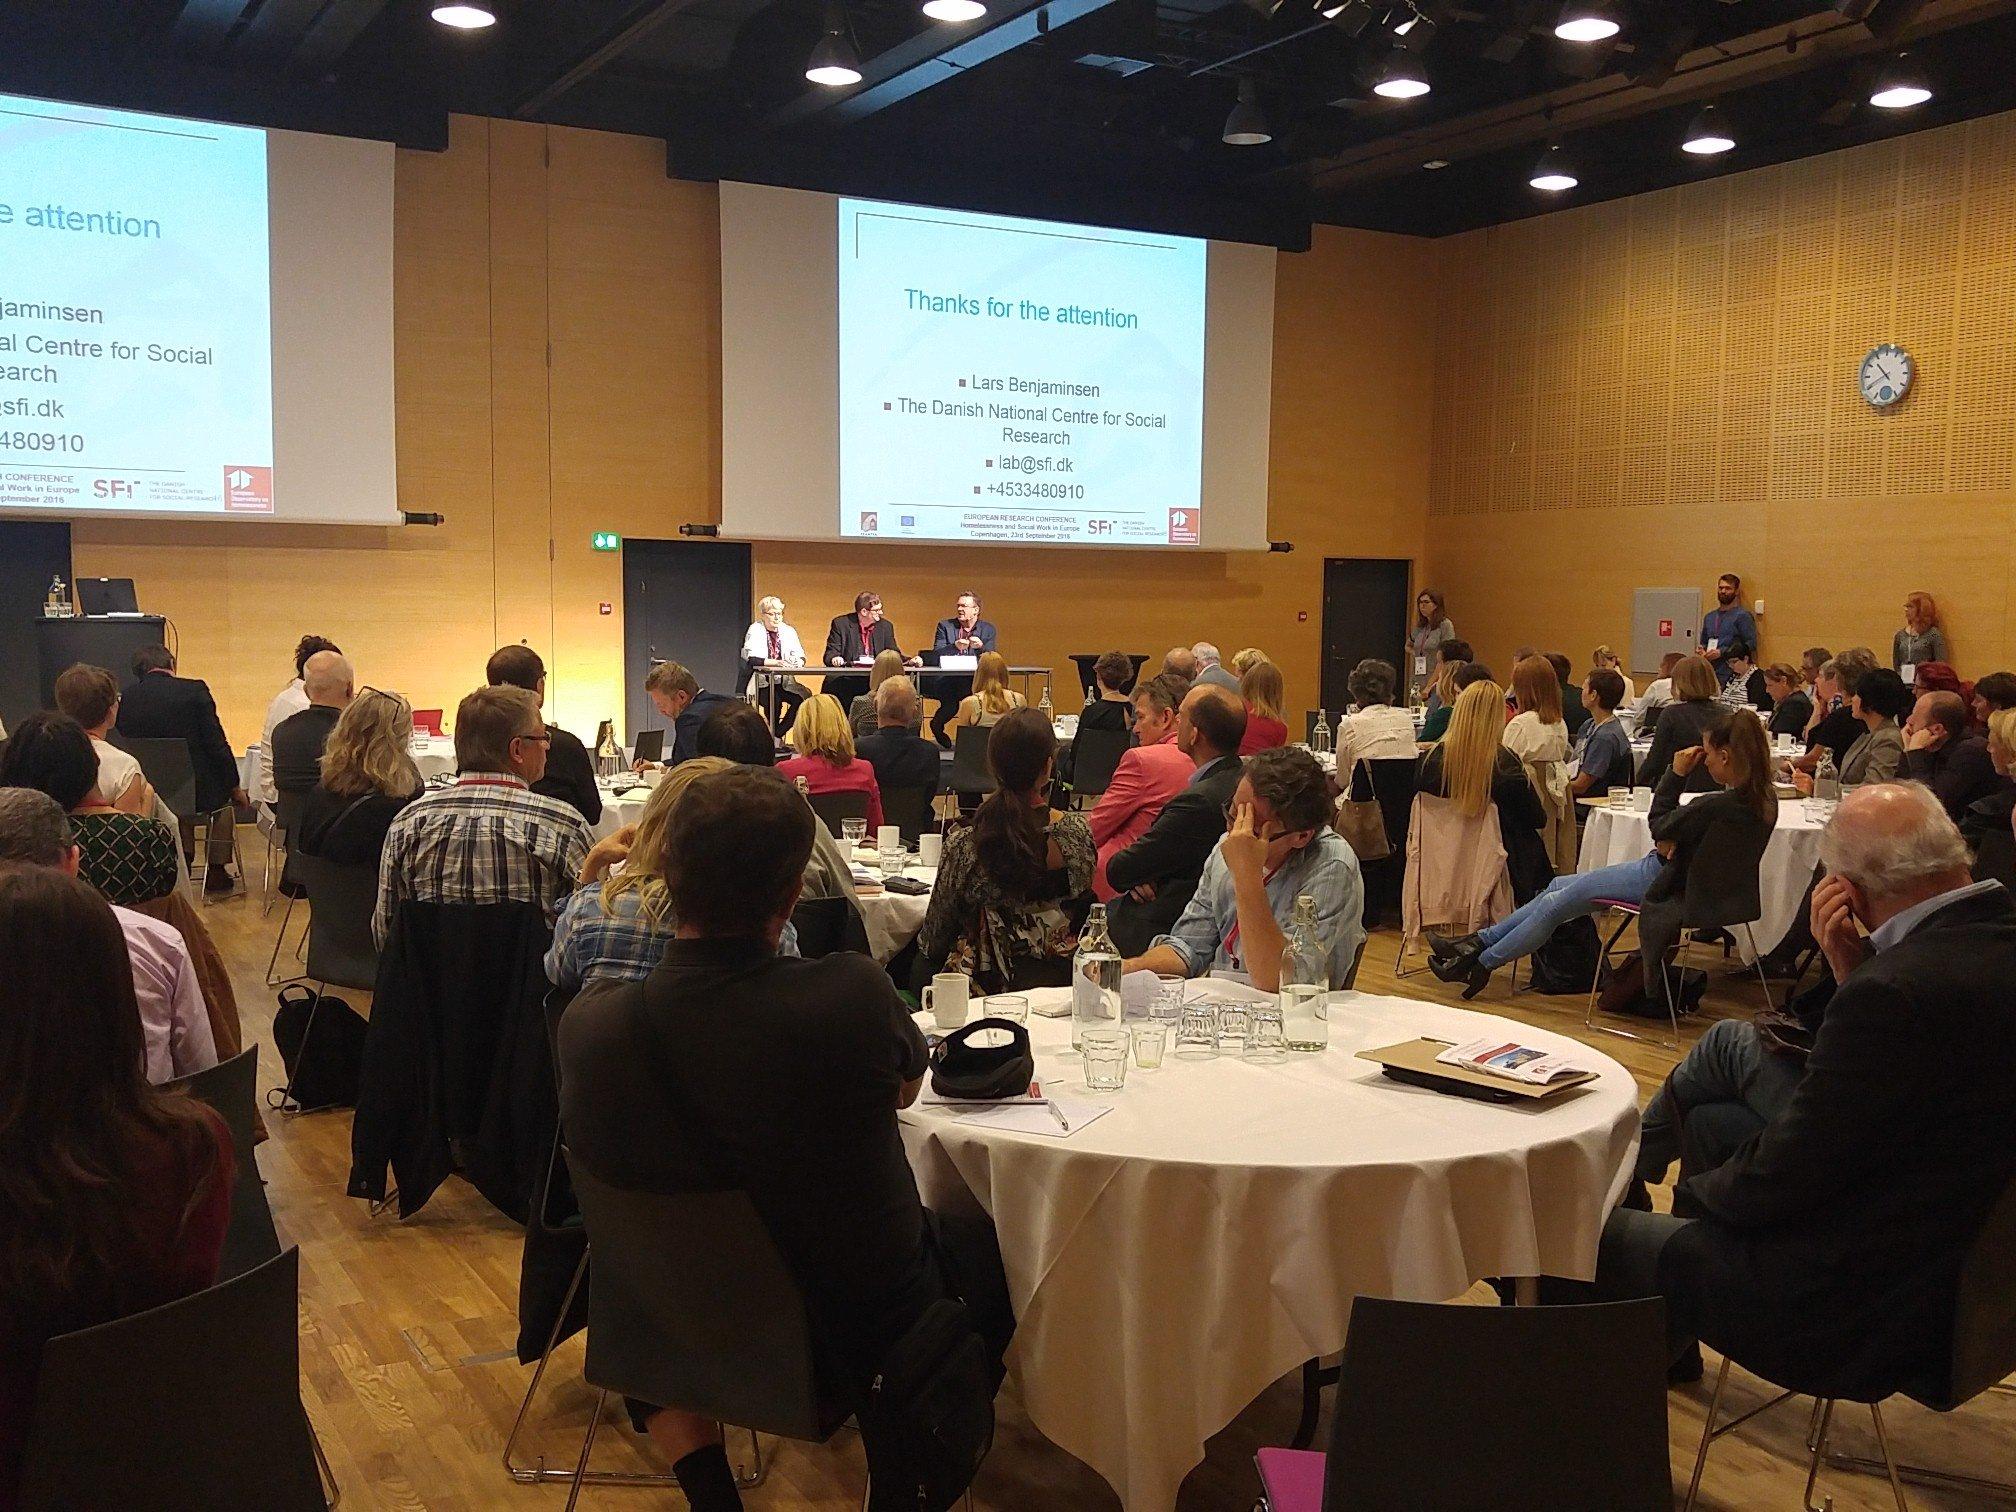 Q&A session with keynote speakers Deborah Padgett & Lars Benjaminsen at #eoh2016 https://t.co/wLKVi2k4Cd